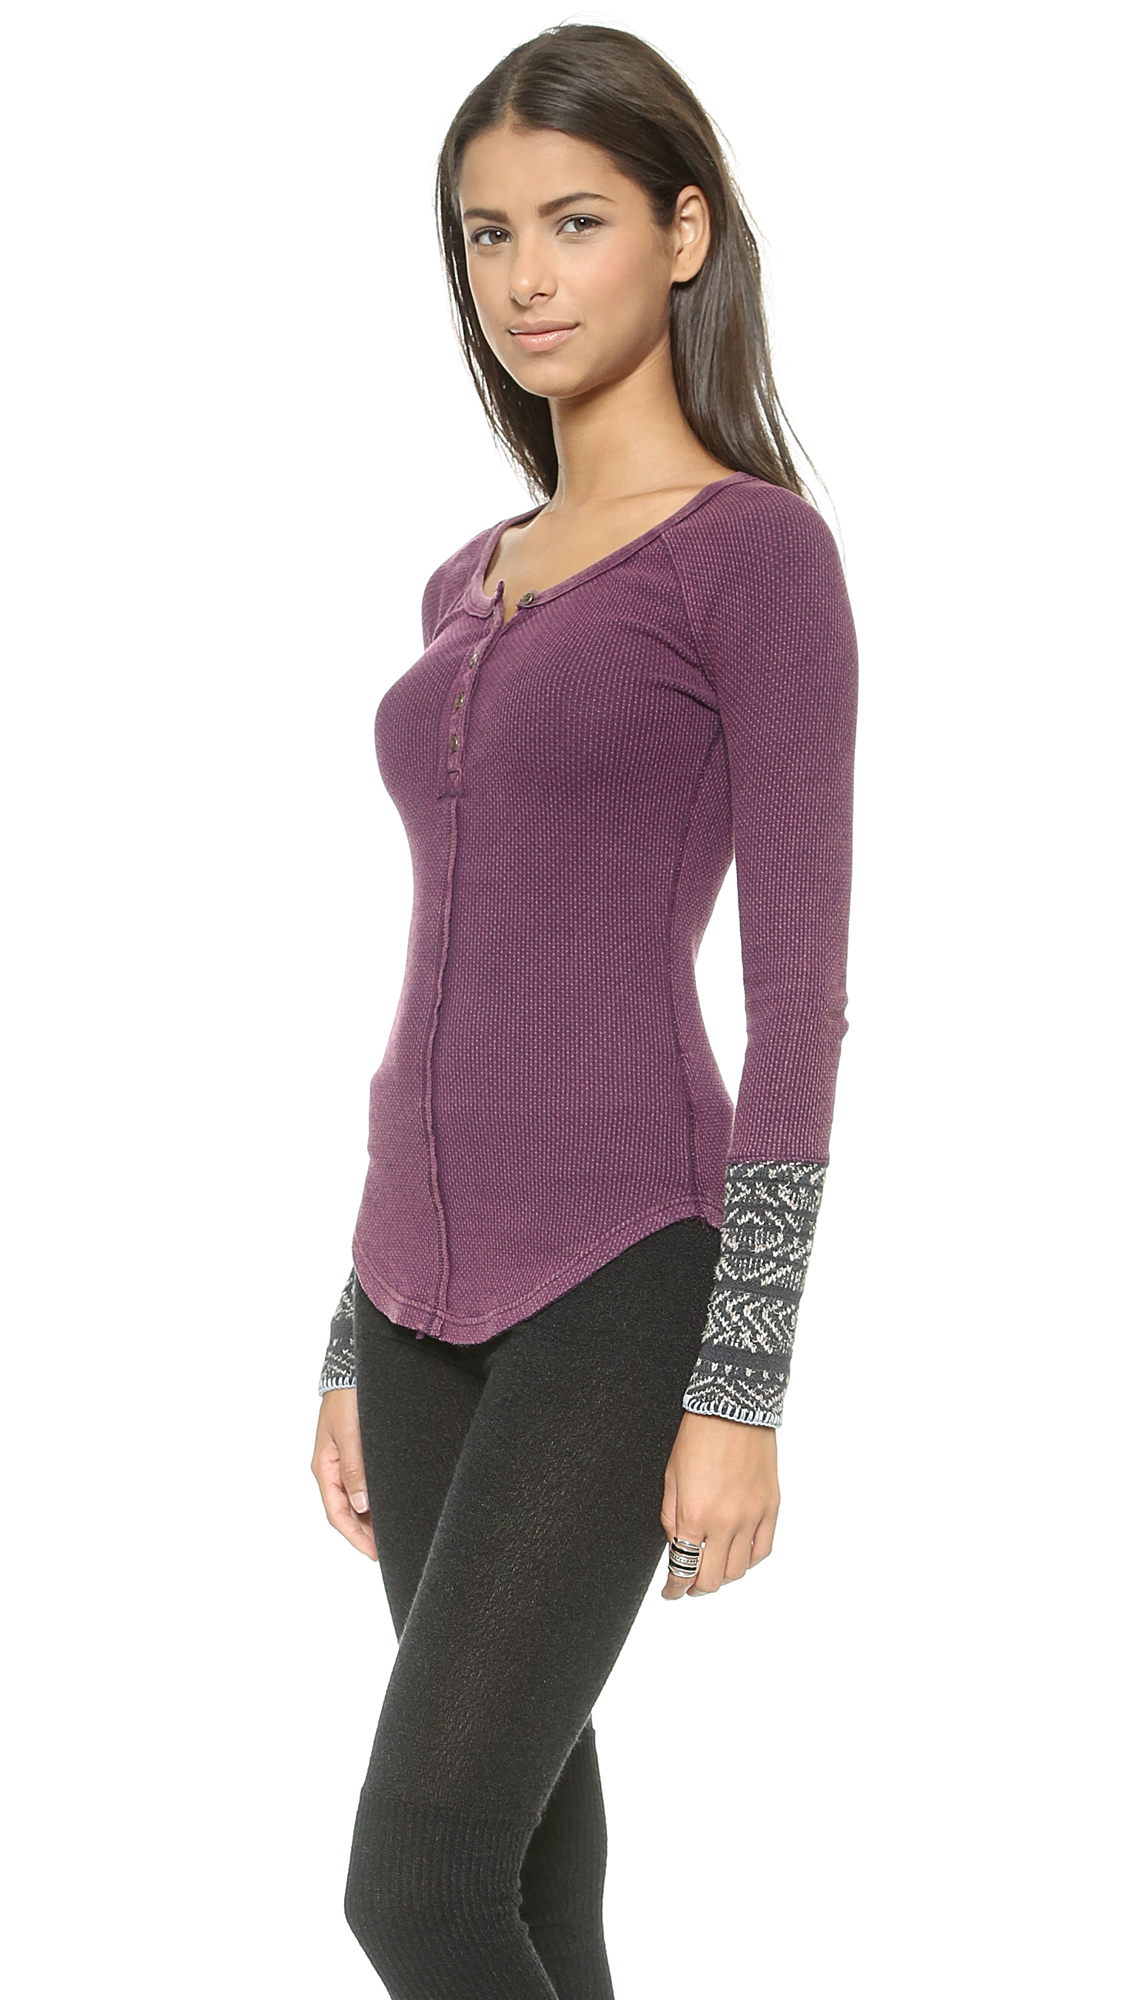 6742cce9e0b9 Free People Alpine Cuff Newbie Thermal Top - Black in Purple - Lyst